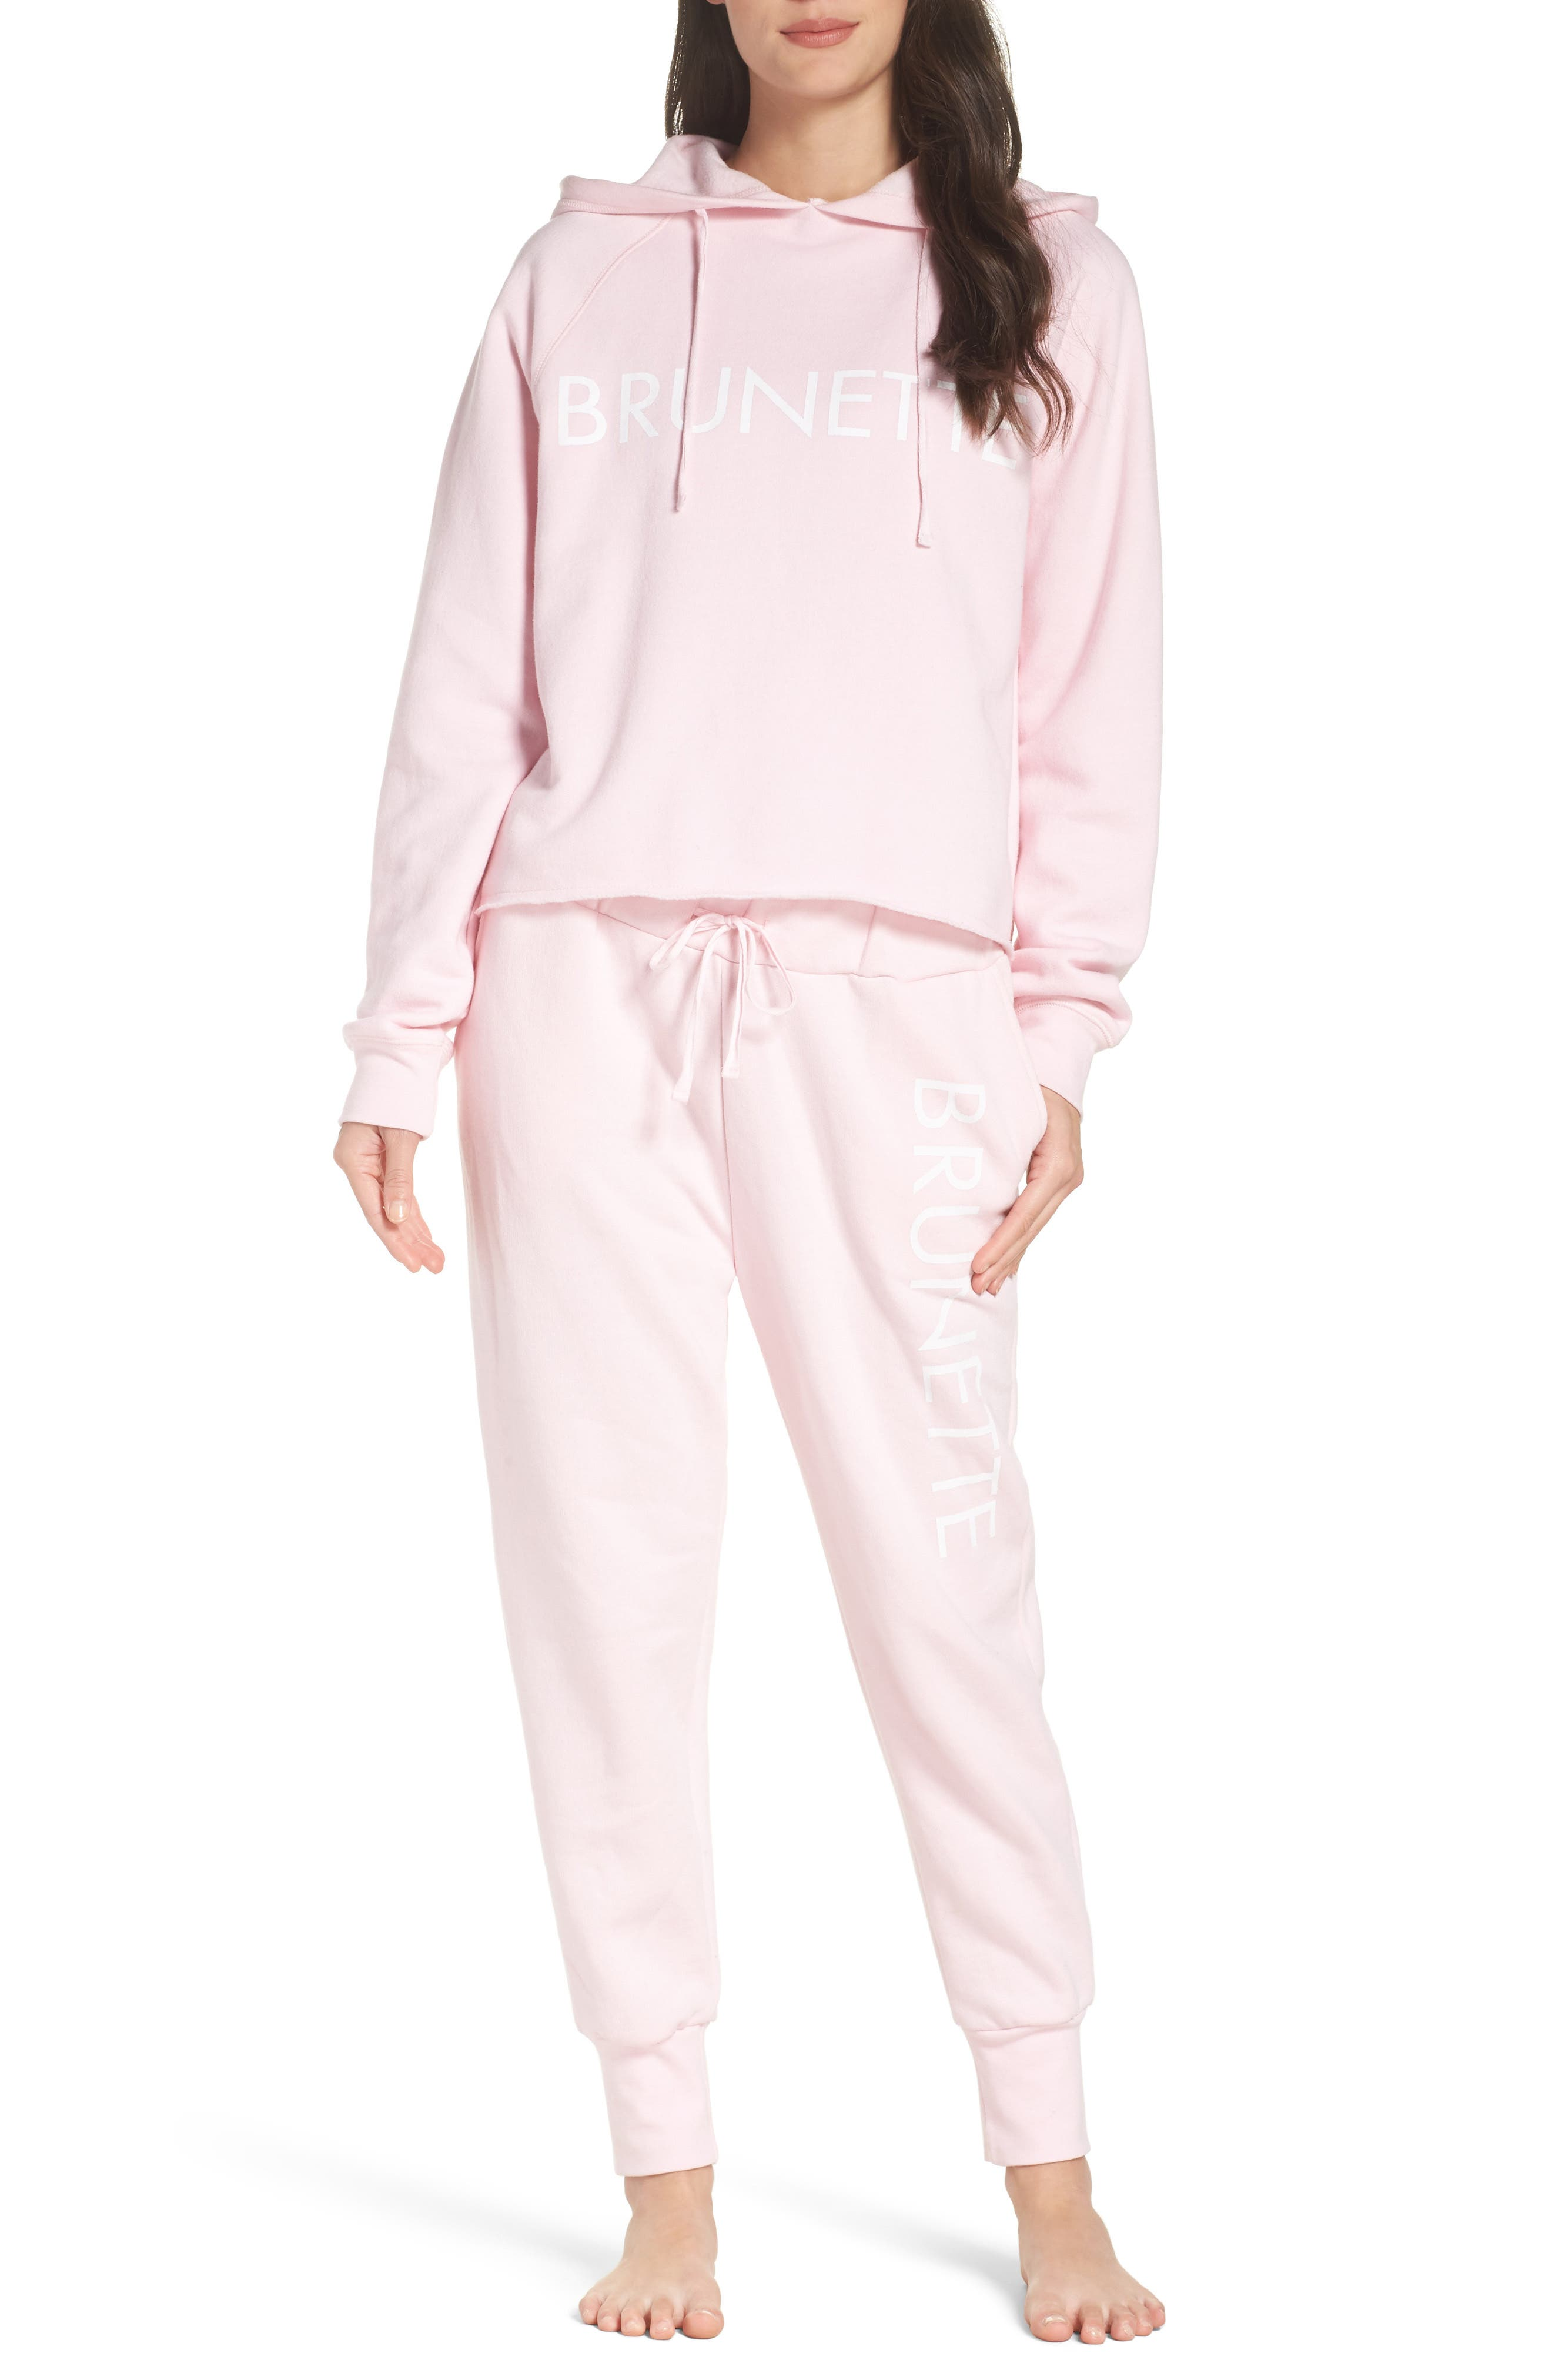 Brunette Jogger Pants,                             Alternate thumbnail 6, color,                             Pink